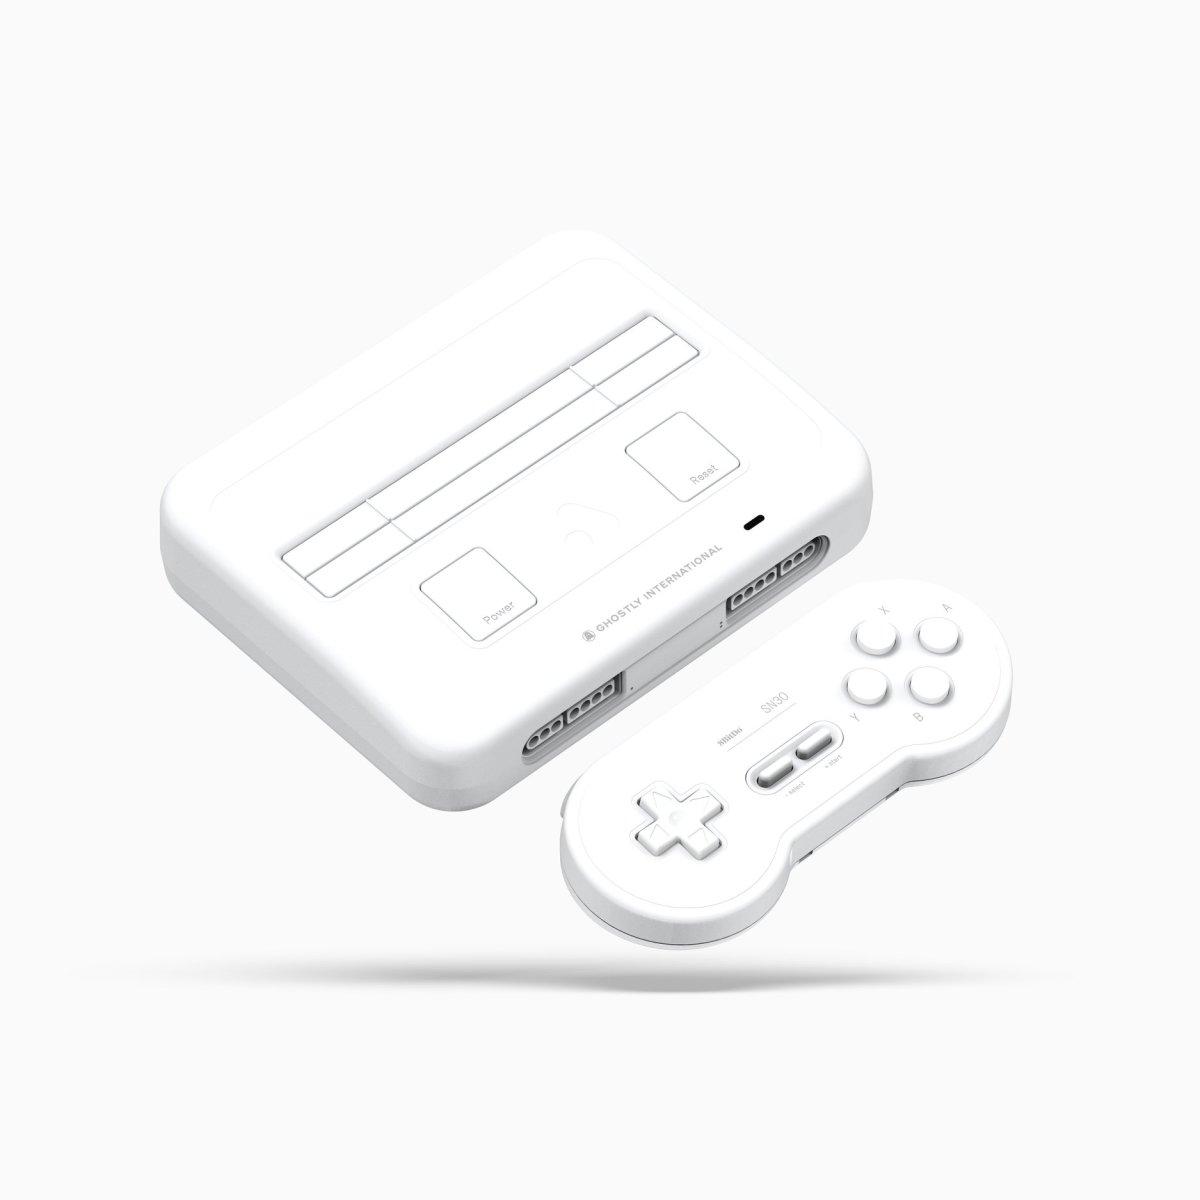 Ghostly Super Nintendo